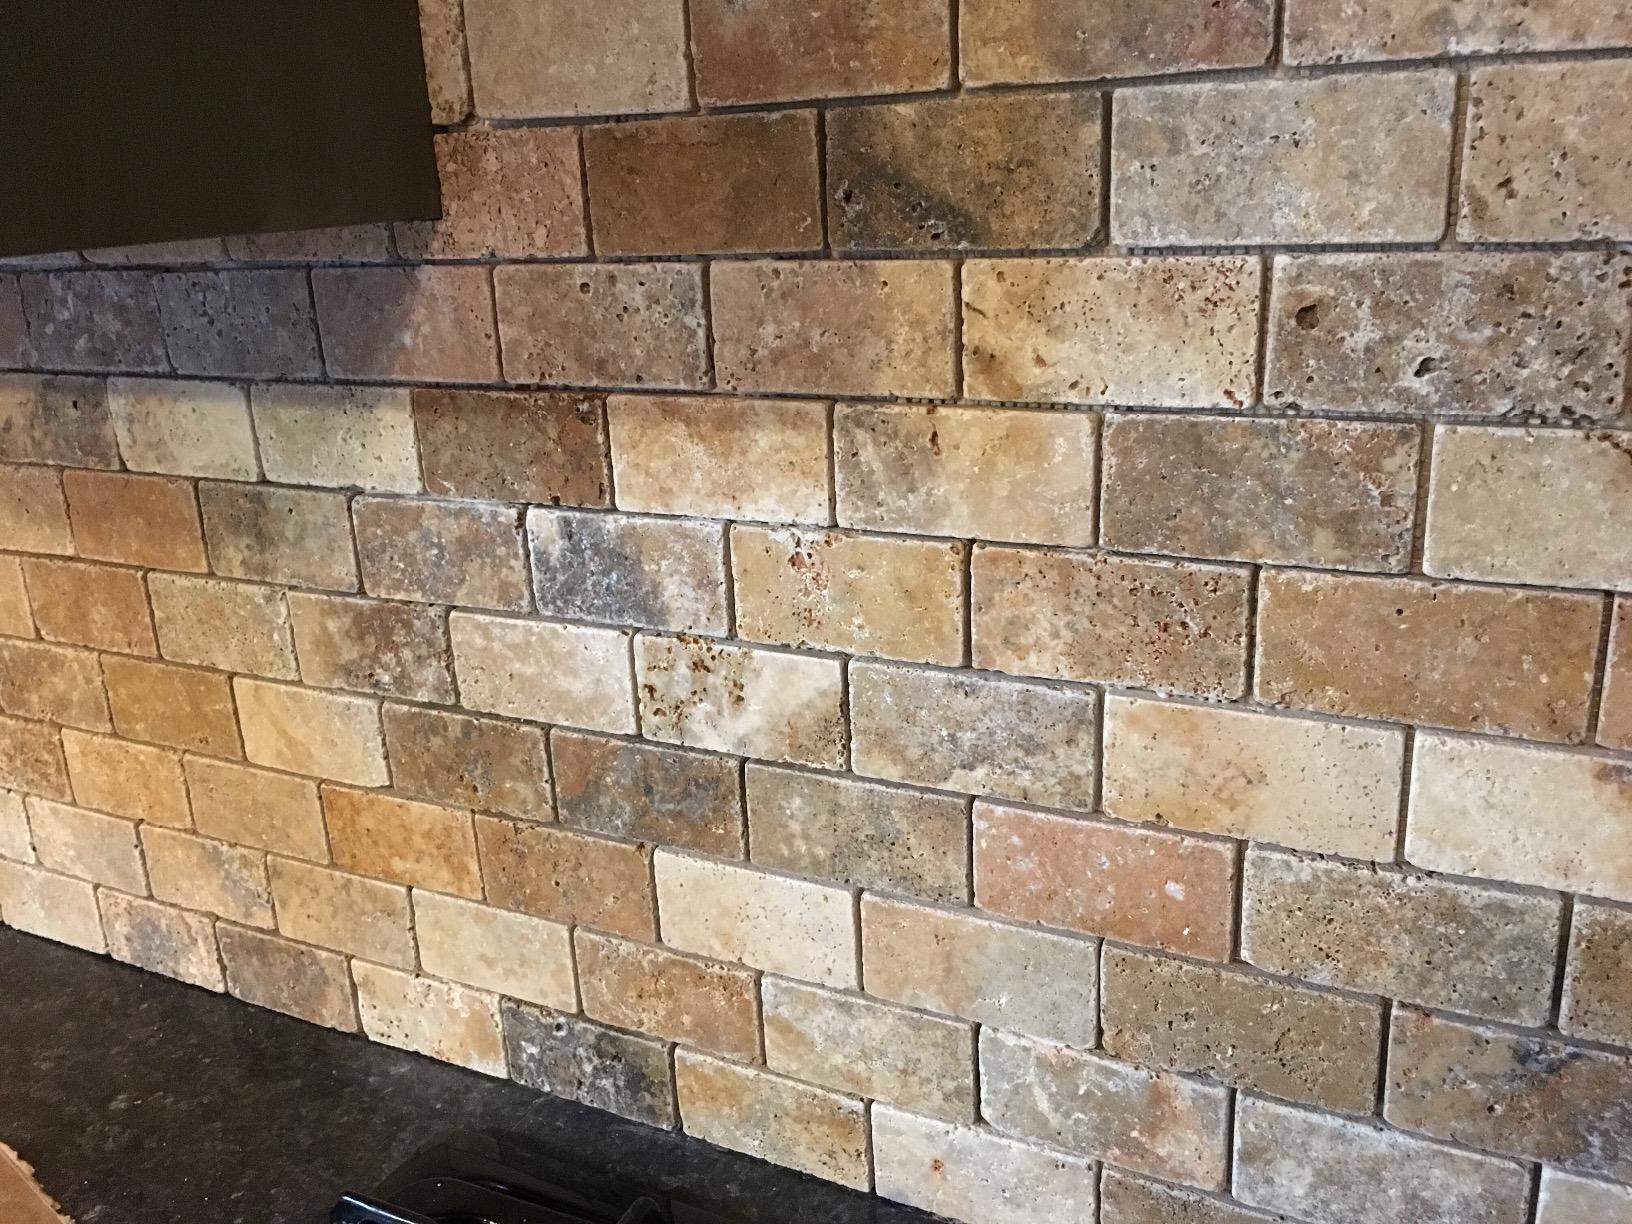 Amazon Com Customer Reviews Scabos Travertine 2 X 4 Brick Mosaic Tile Tumbled 6 X 6 Sample Travertine Mosaic Tiles Travertine Mosaic Tiles